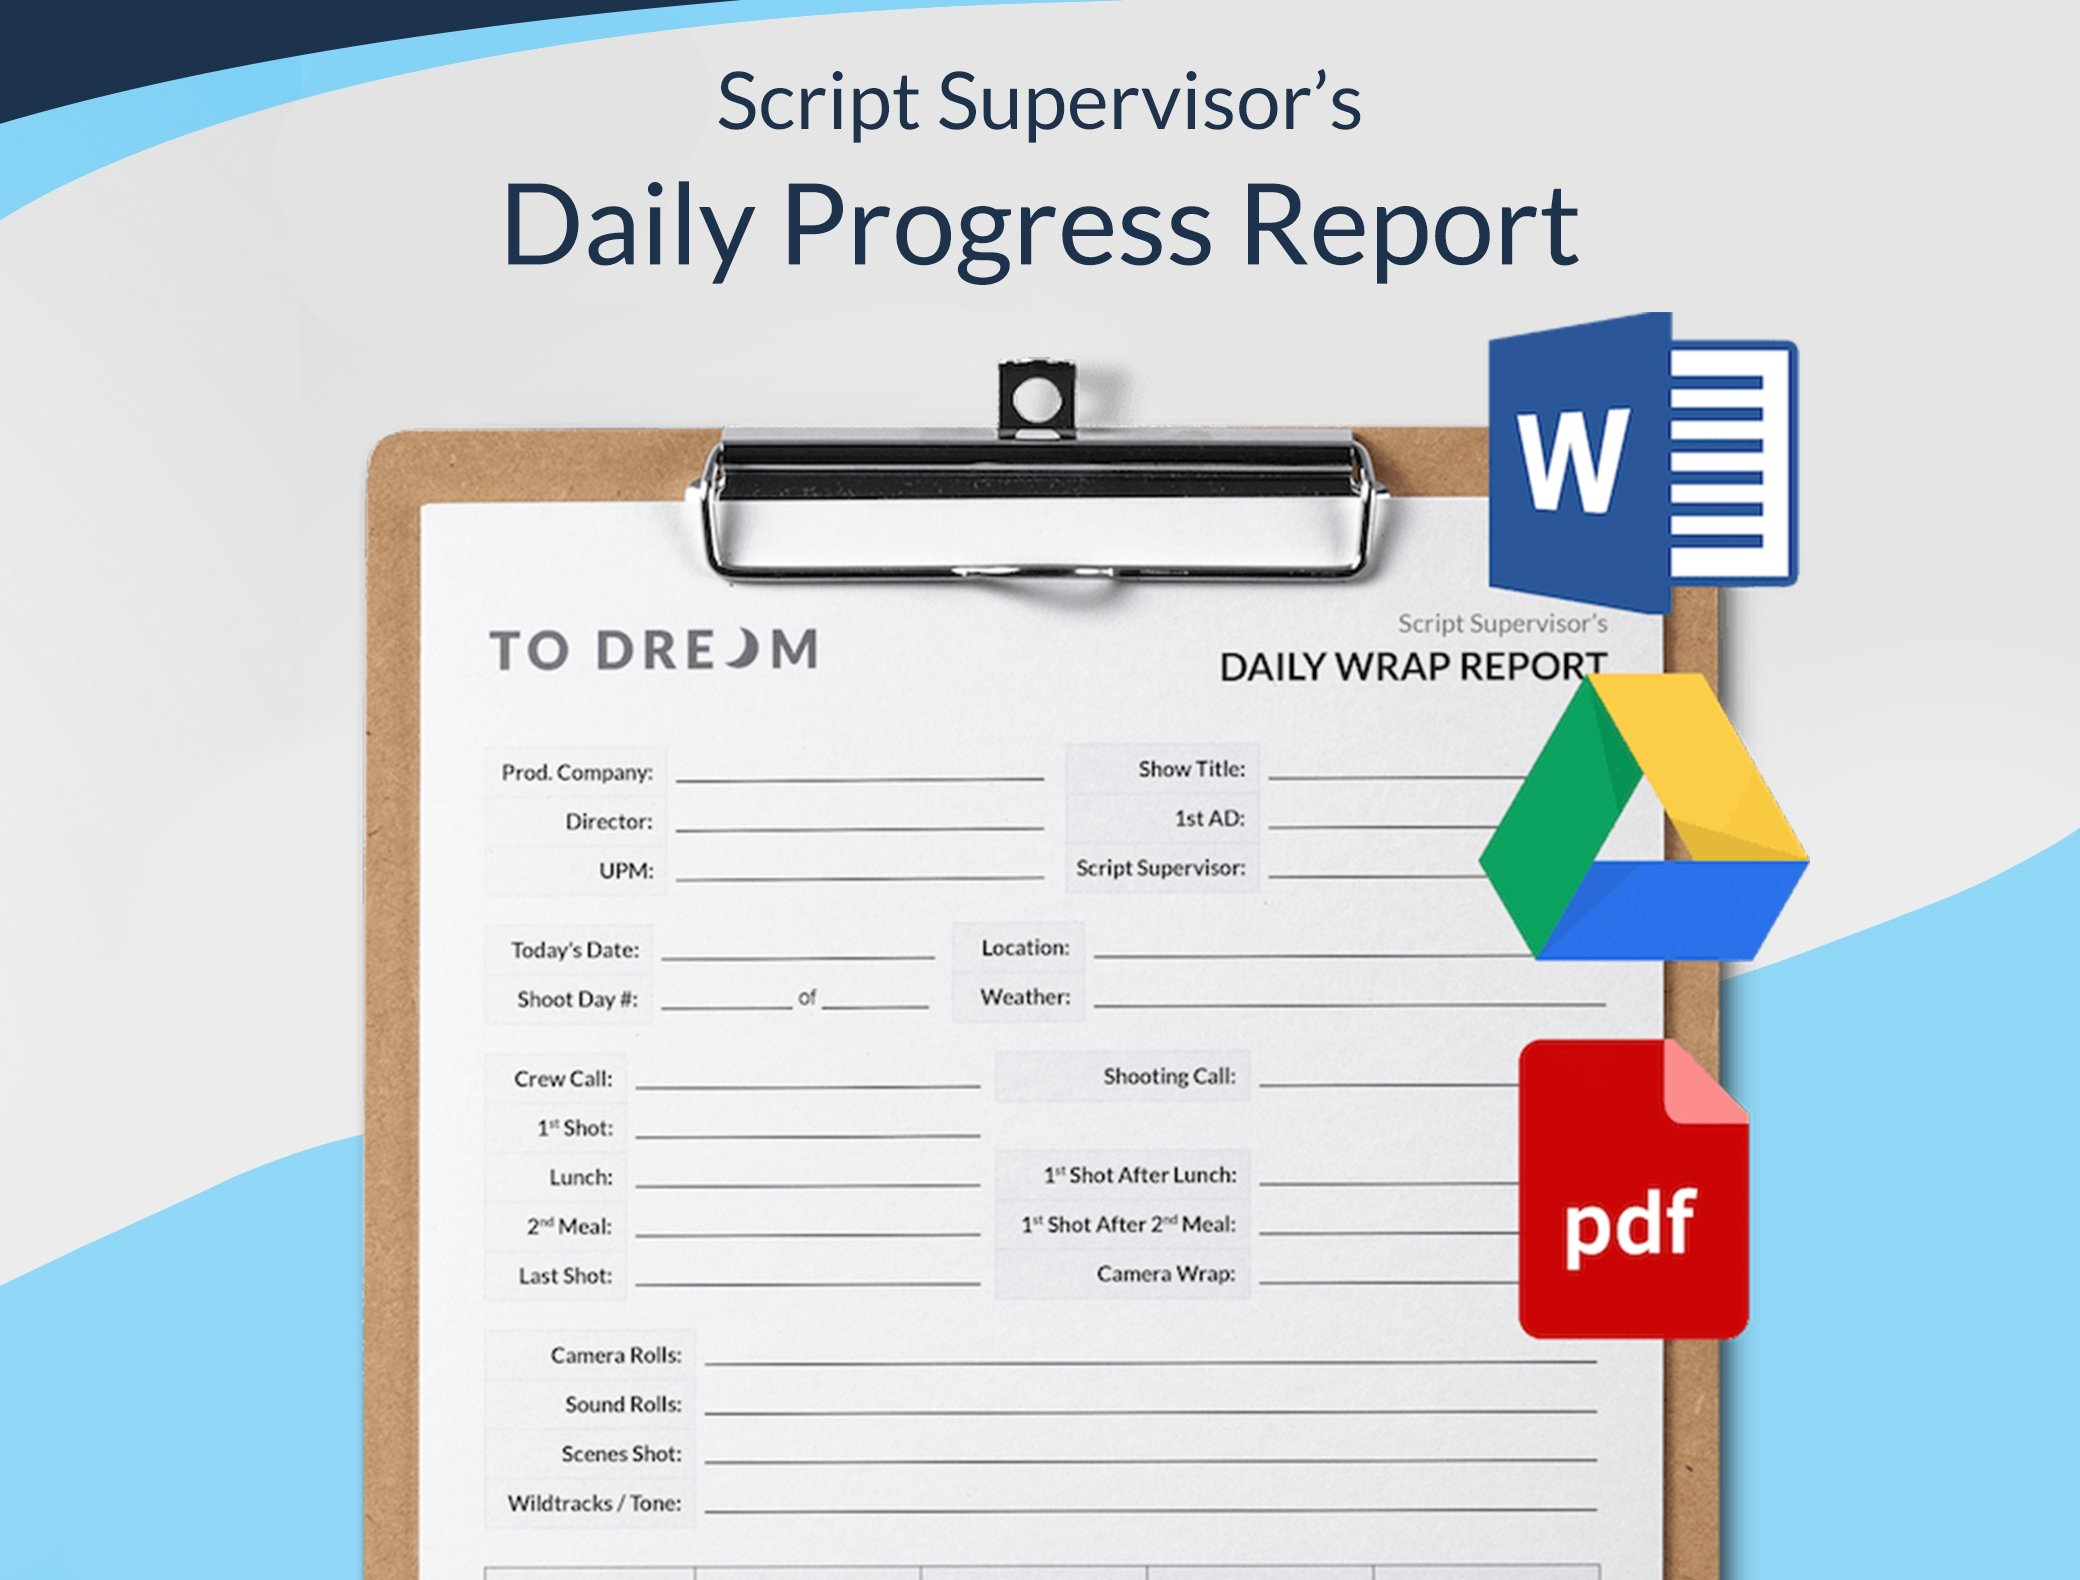 Script Supervisor Daily Progress Report - Free Template Download